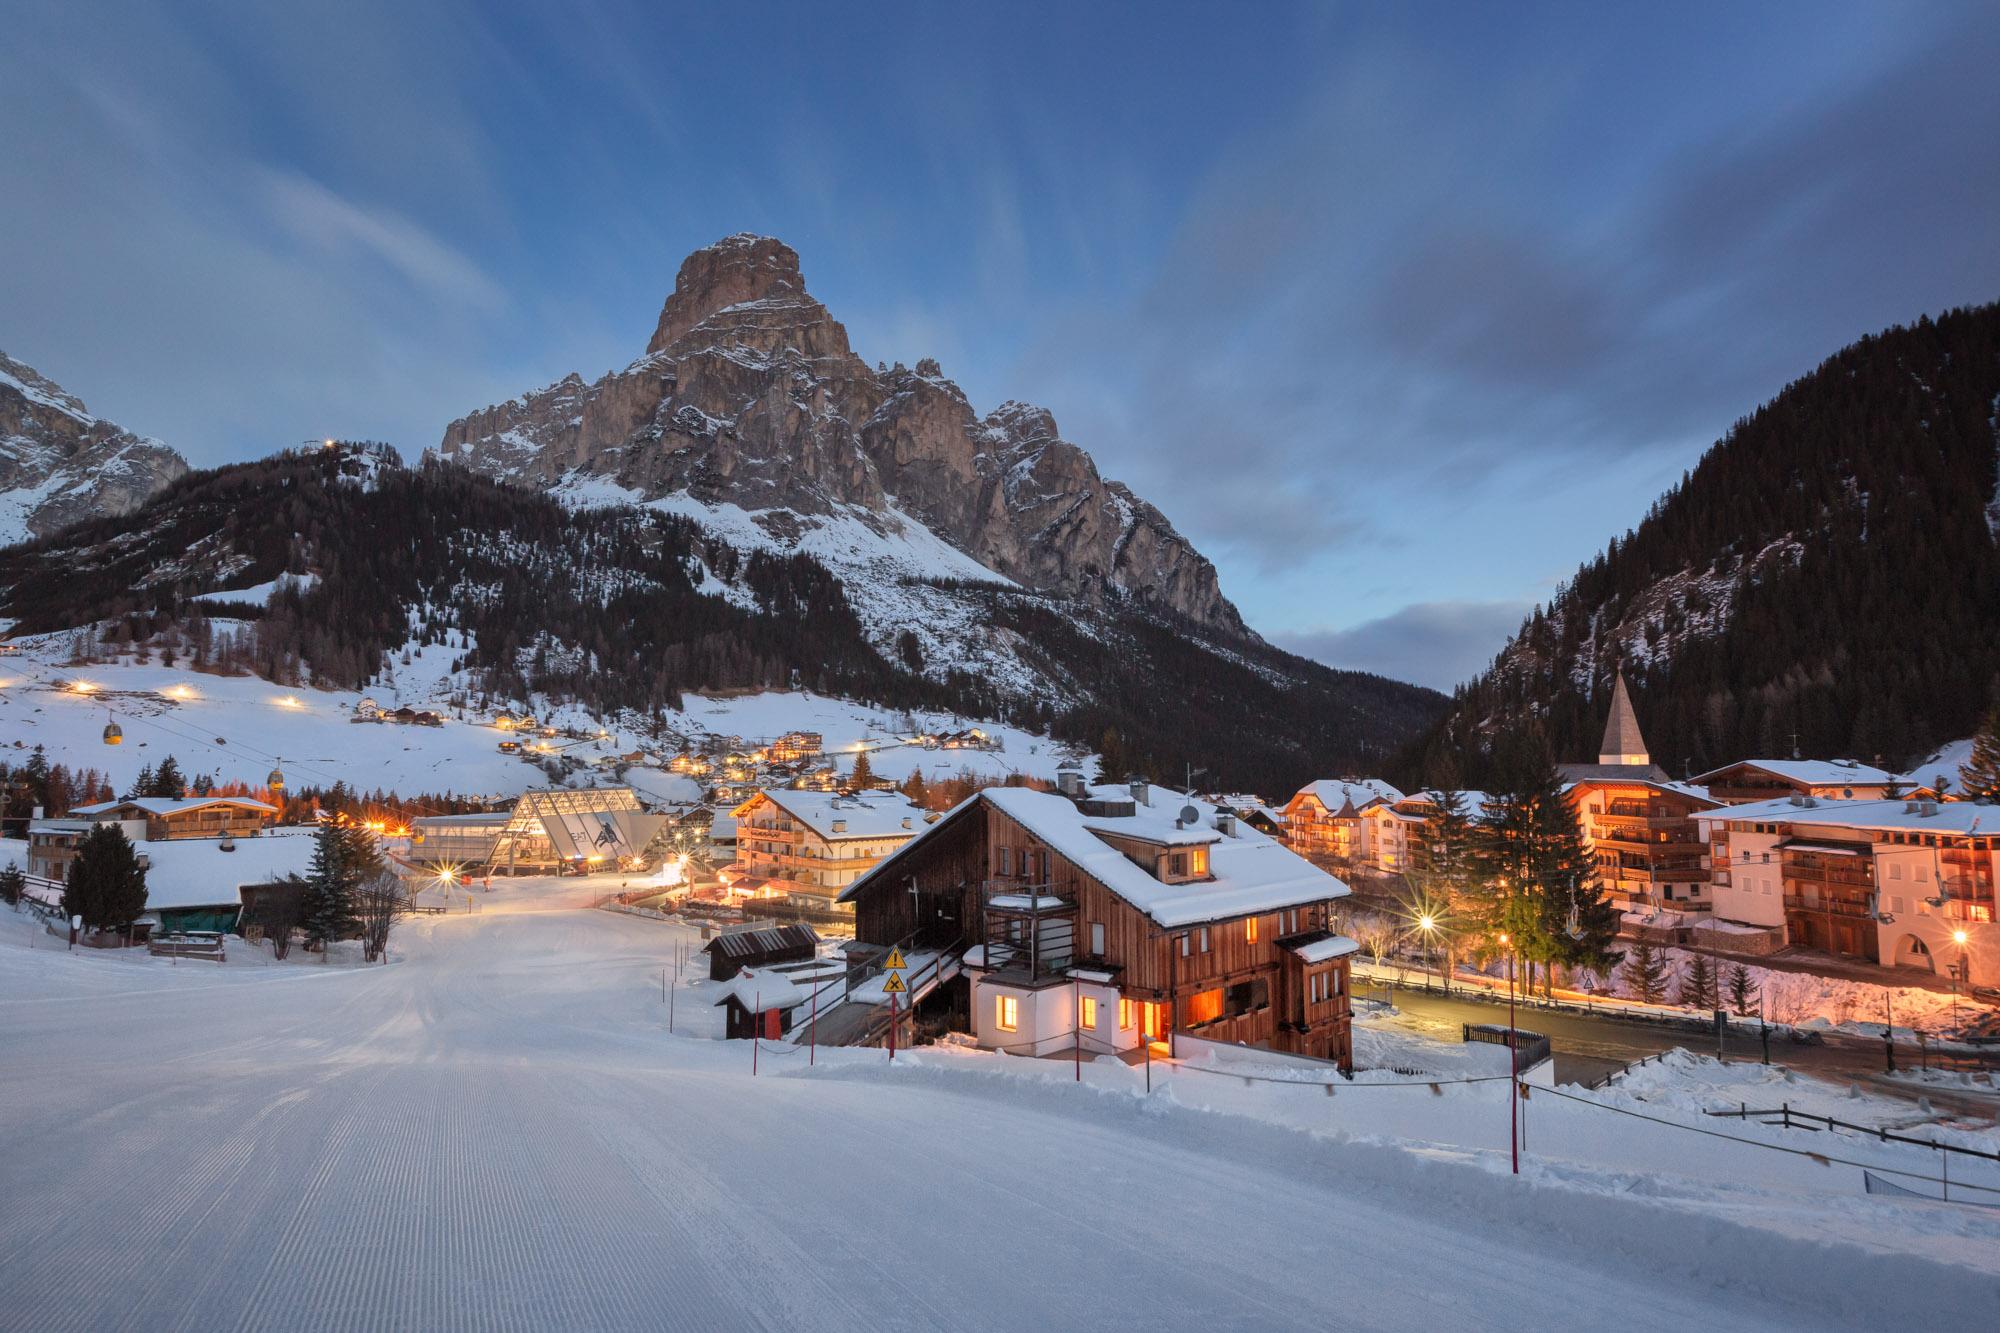 Ski Resort of Corvara, Alta Badia, Dolomites, Italy